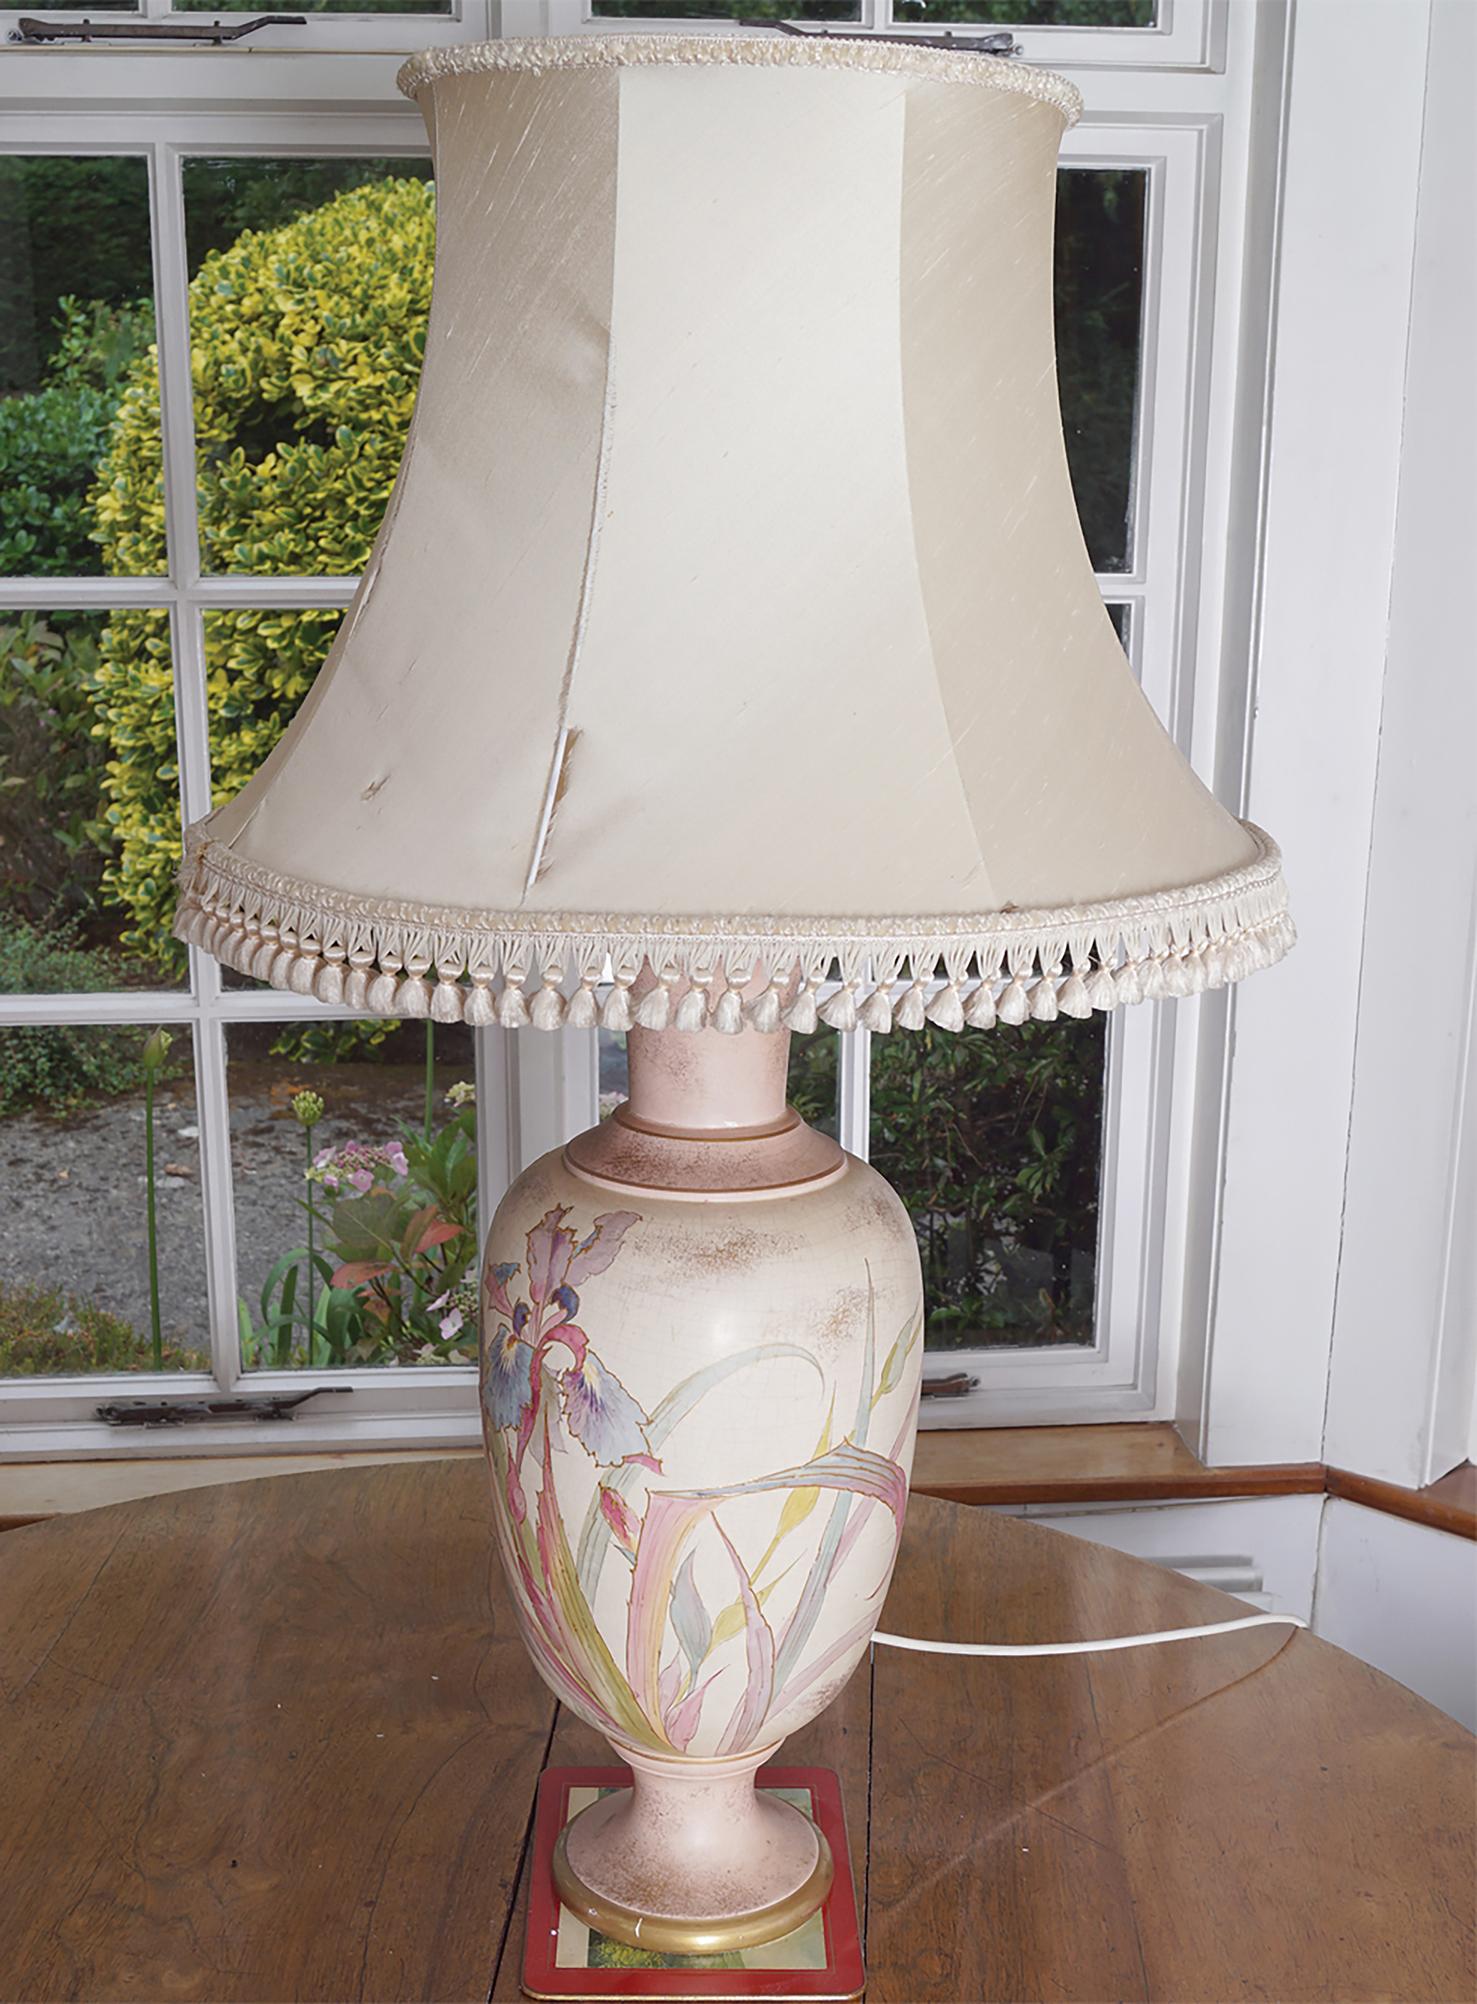 19TH-CENTURY WORCESTER VASE STEMMED TABLE LAMP